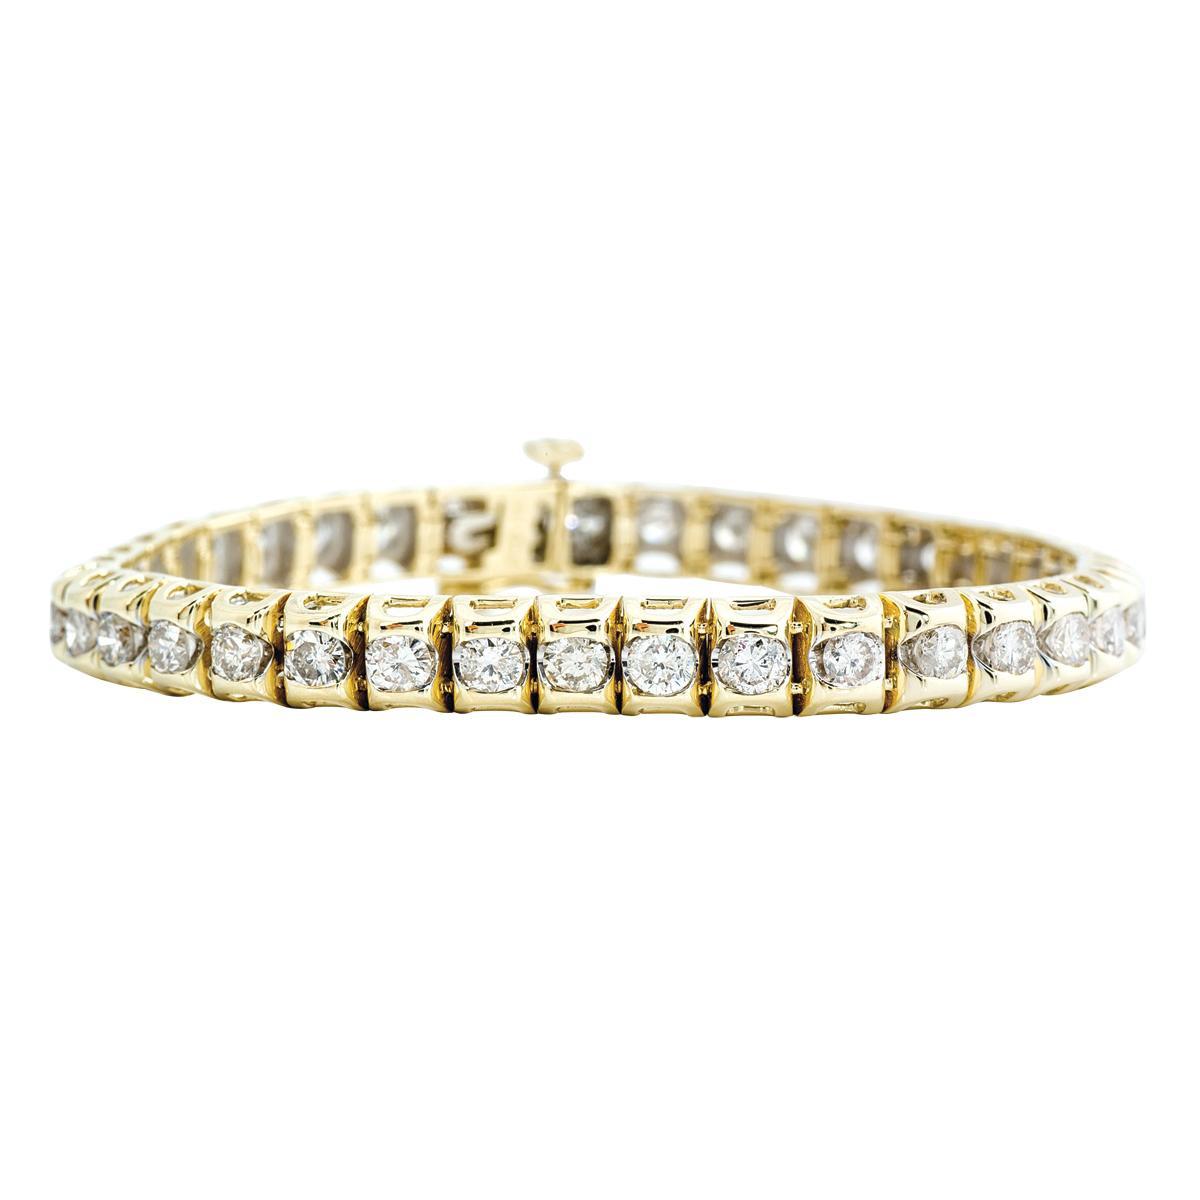 Vintage 6.00 CTW Diamond Tennis Bracelet